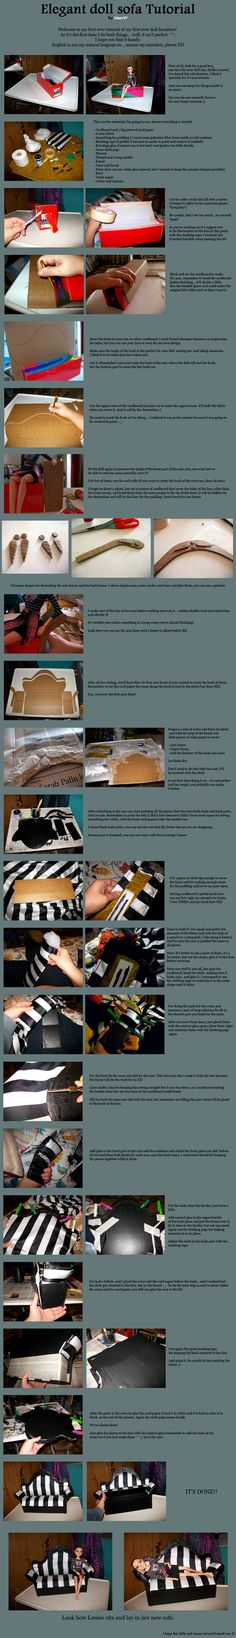 Elegant doll sofa tutorial by ~MarsW on deviantART